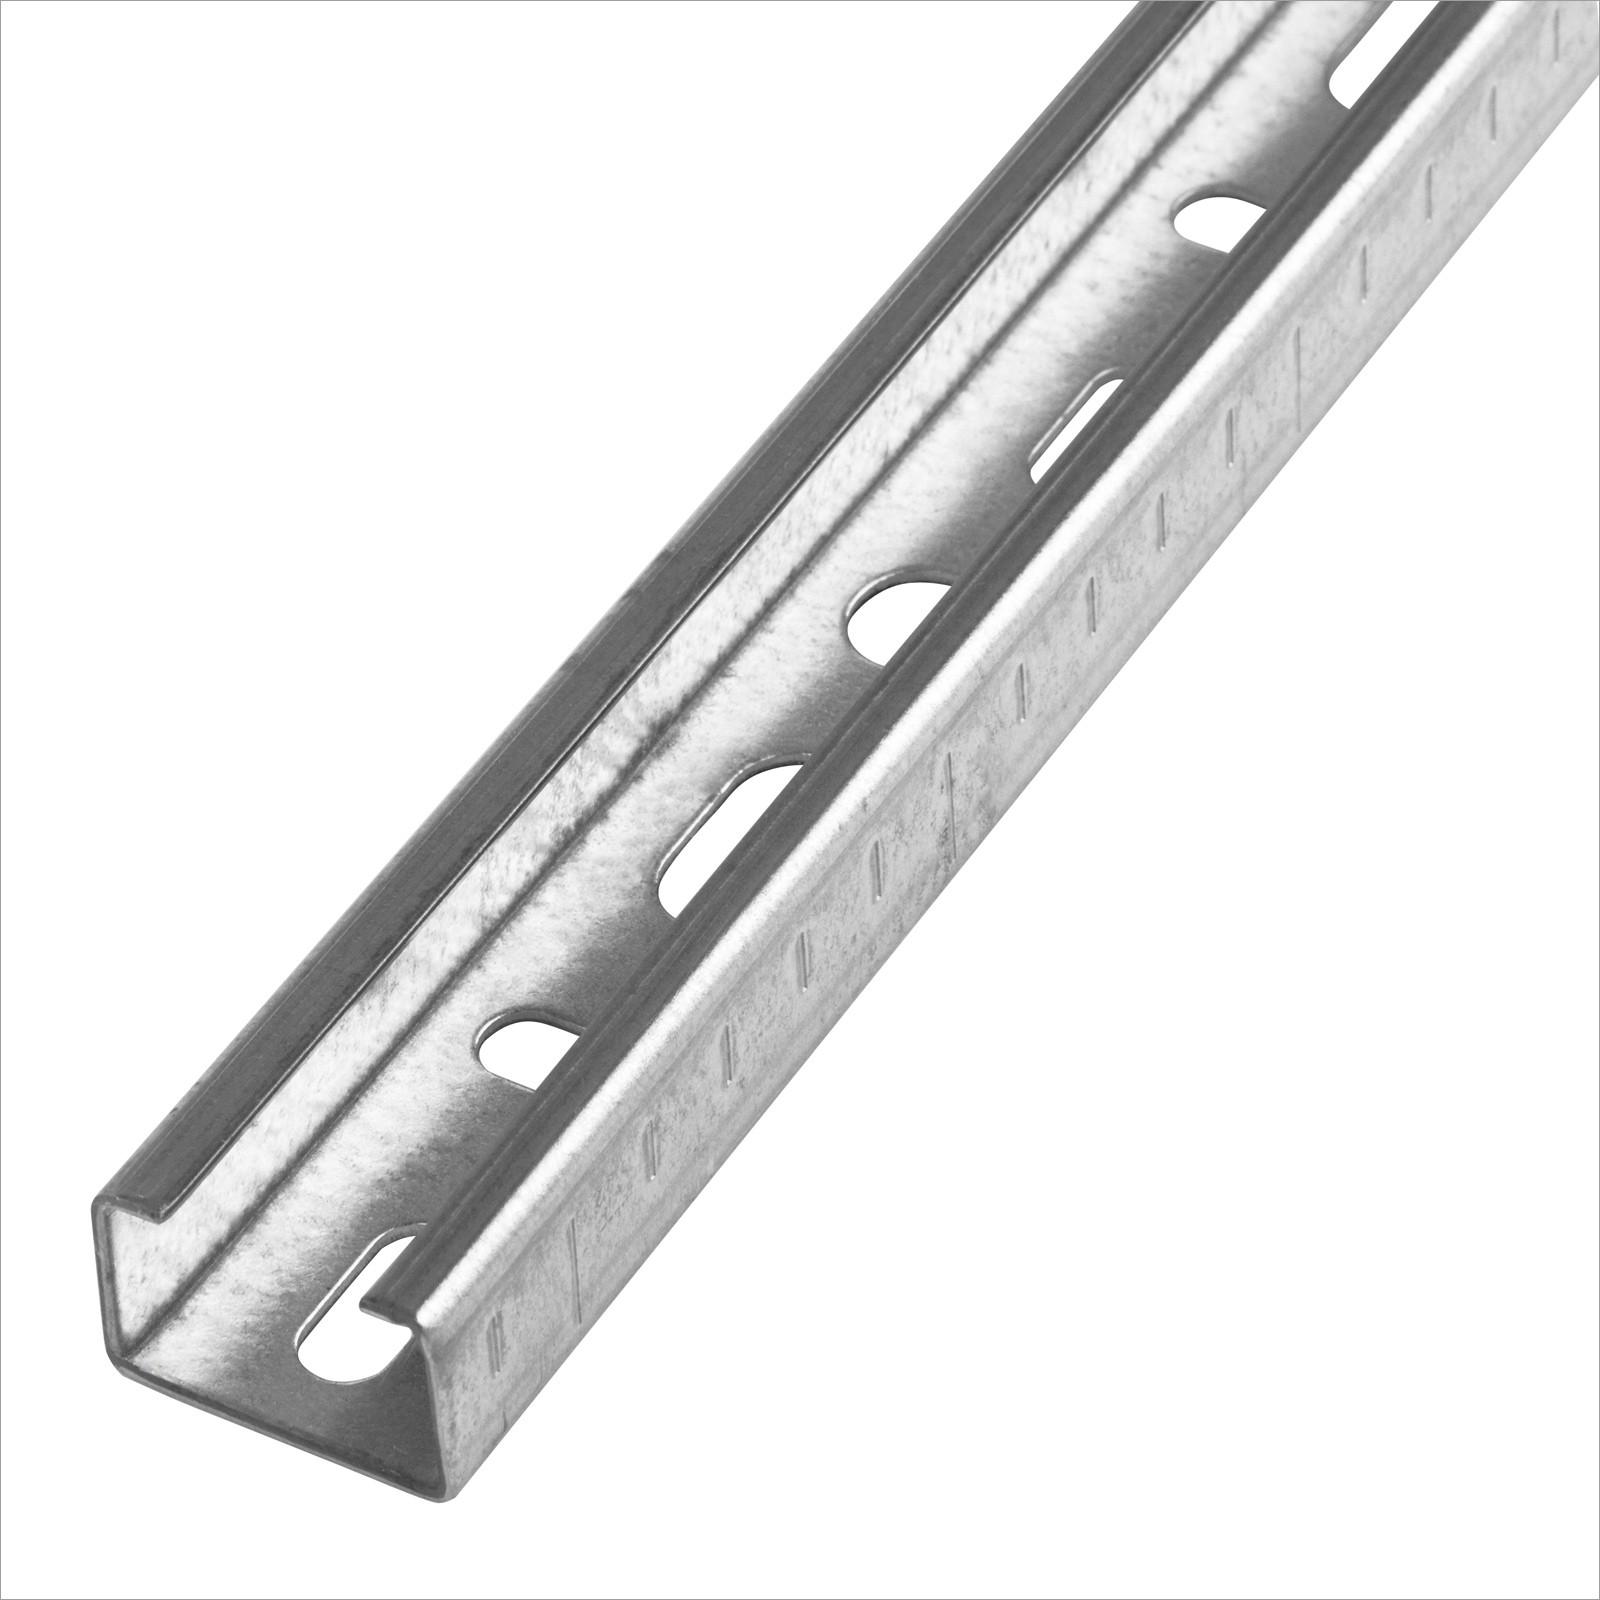 Halteklammern Profilhalter f 50 St C-Profile 27x18 mm